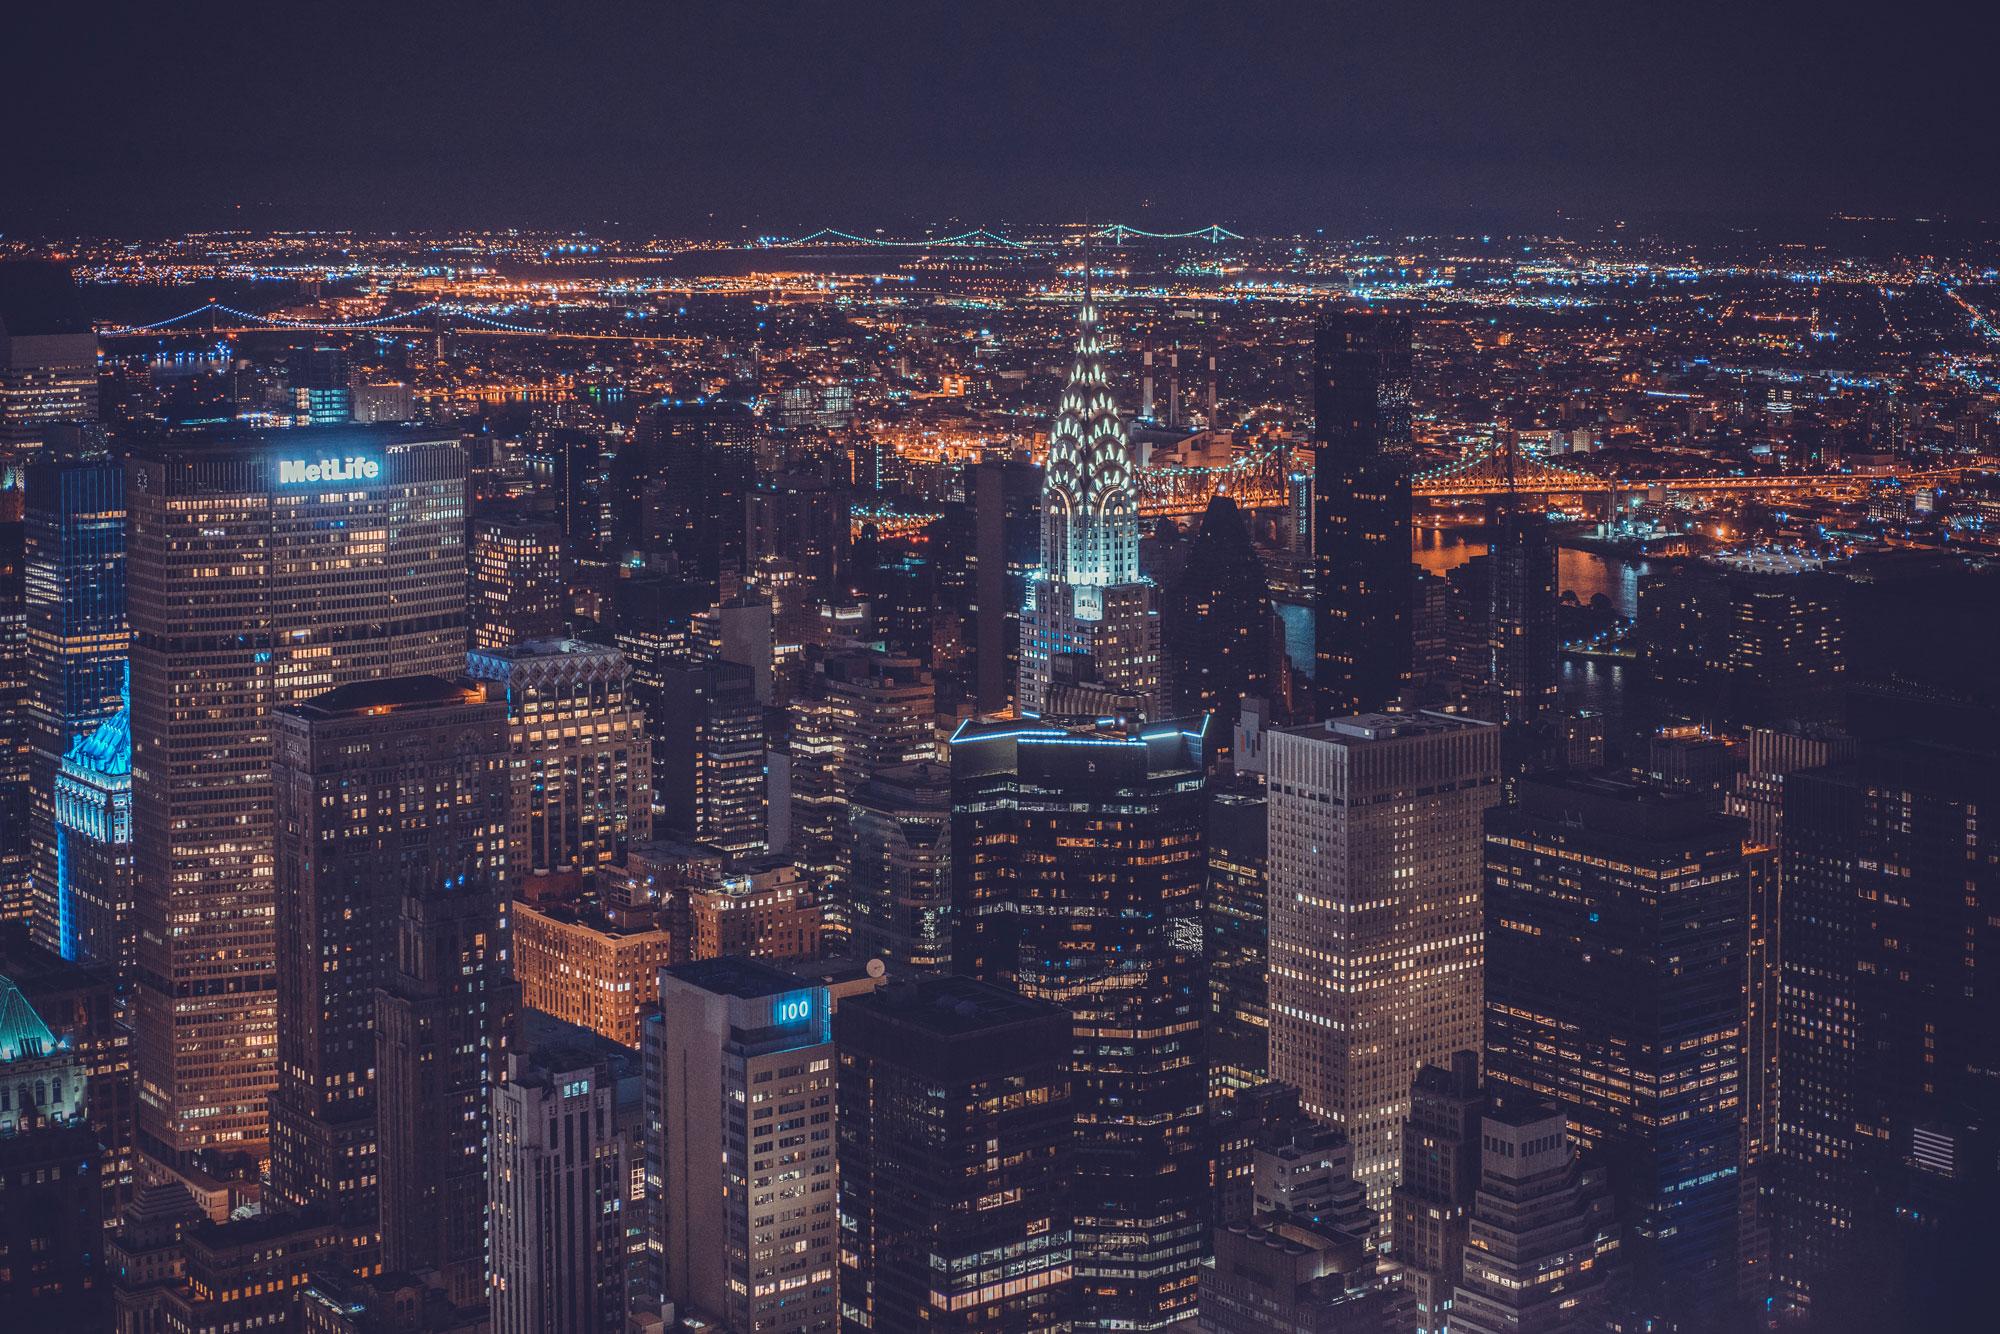 New York City at Night – Daniel Fürg Photography